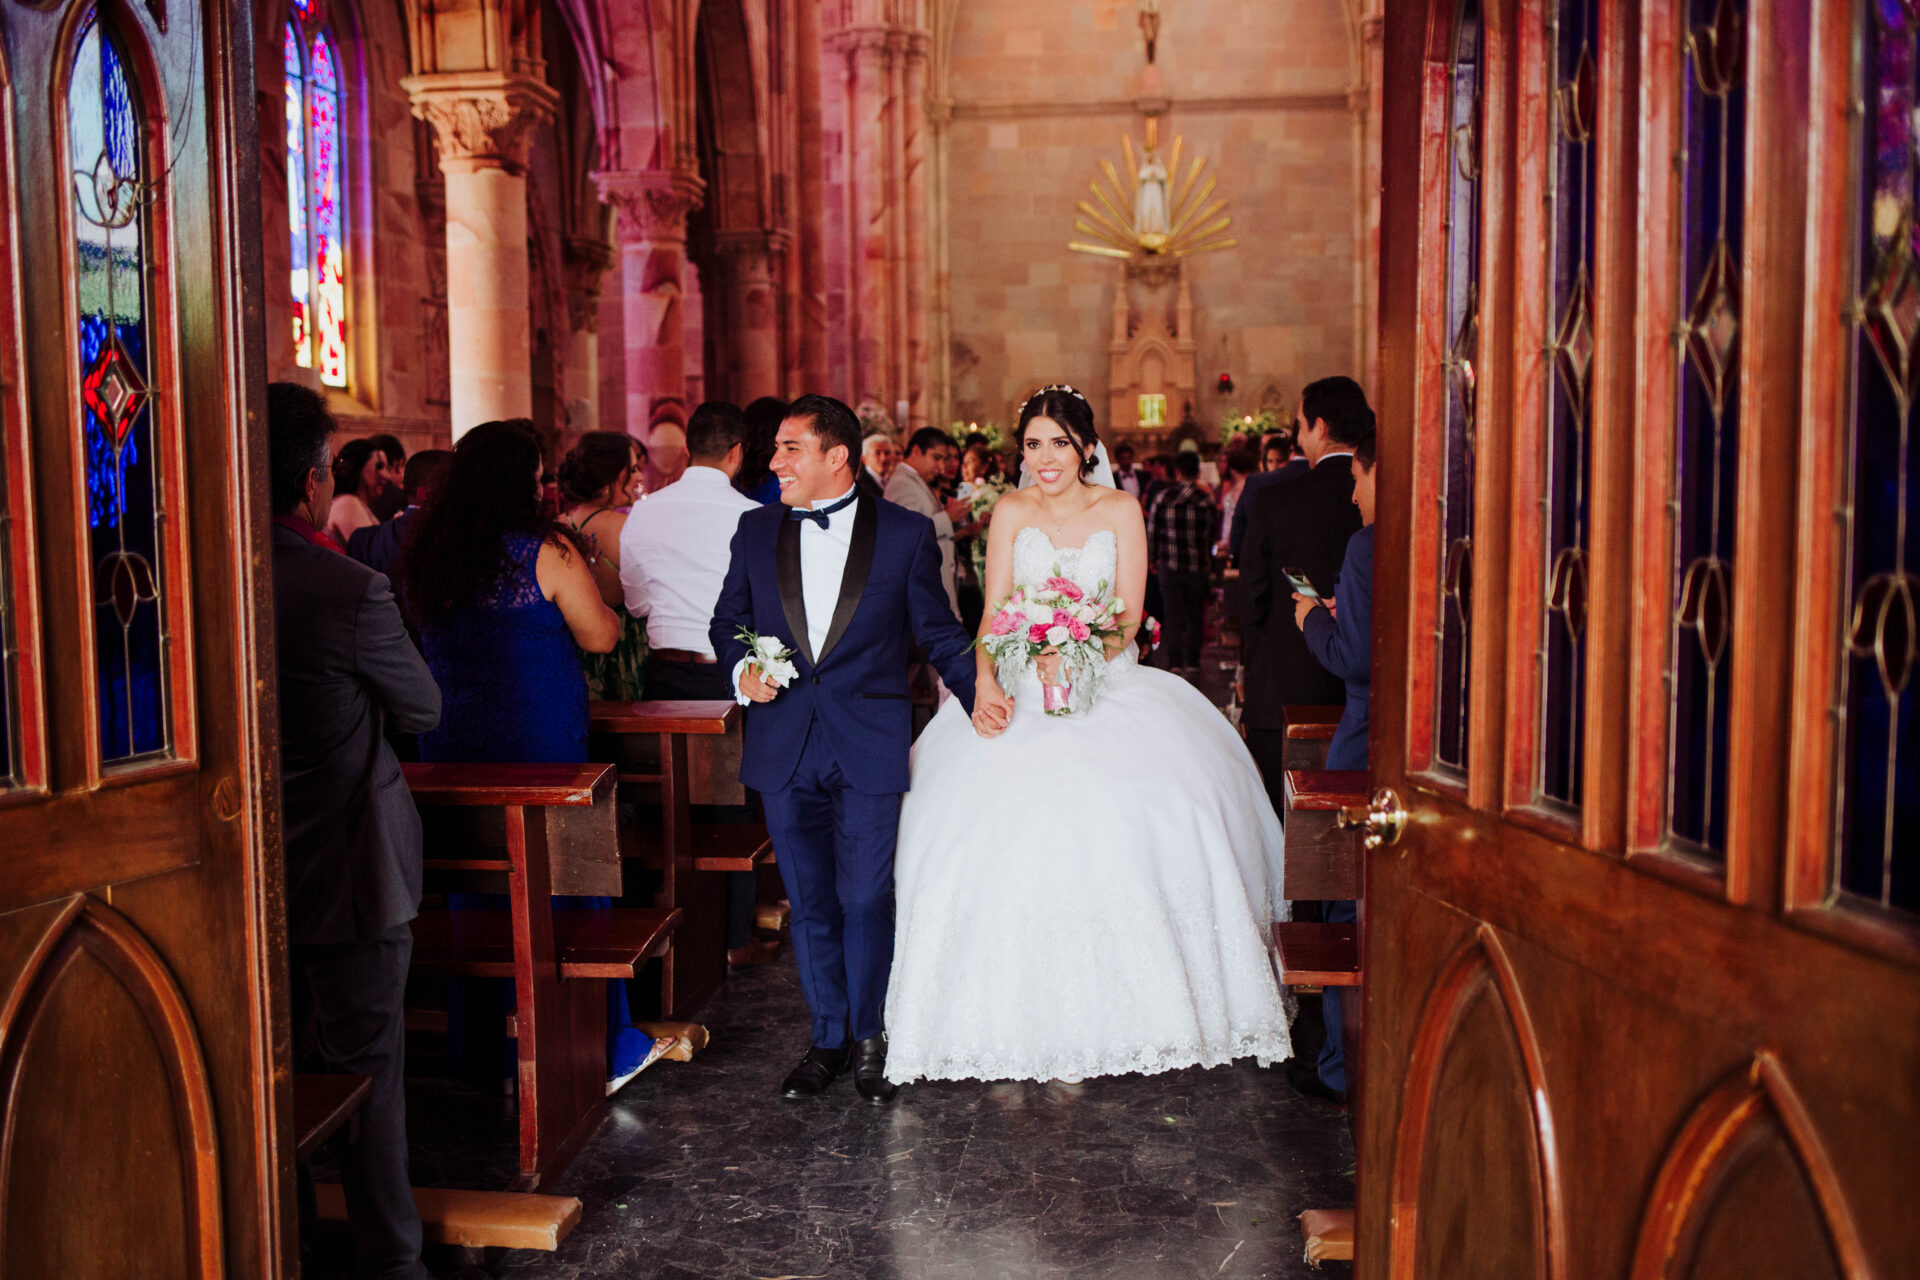 javier_noriega_fotografo_bodas_exhacienda_las_mercedes_zacatecas_wedding_photographer6a